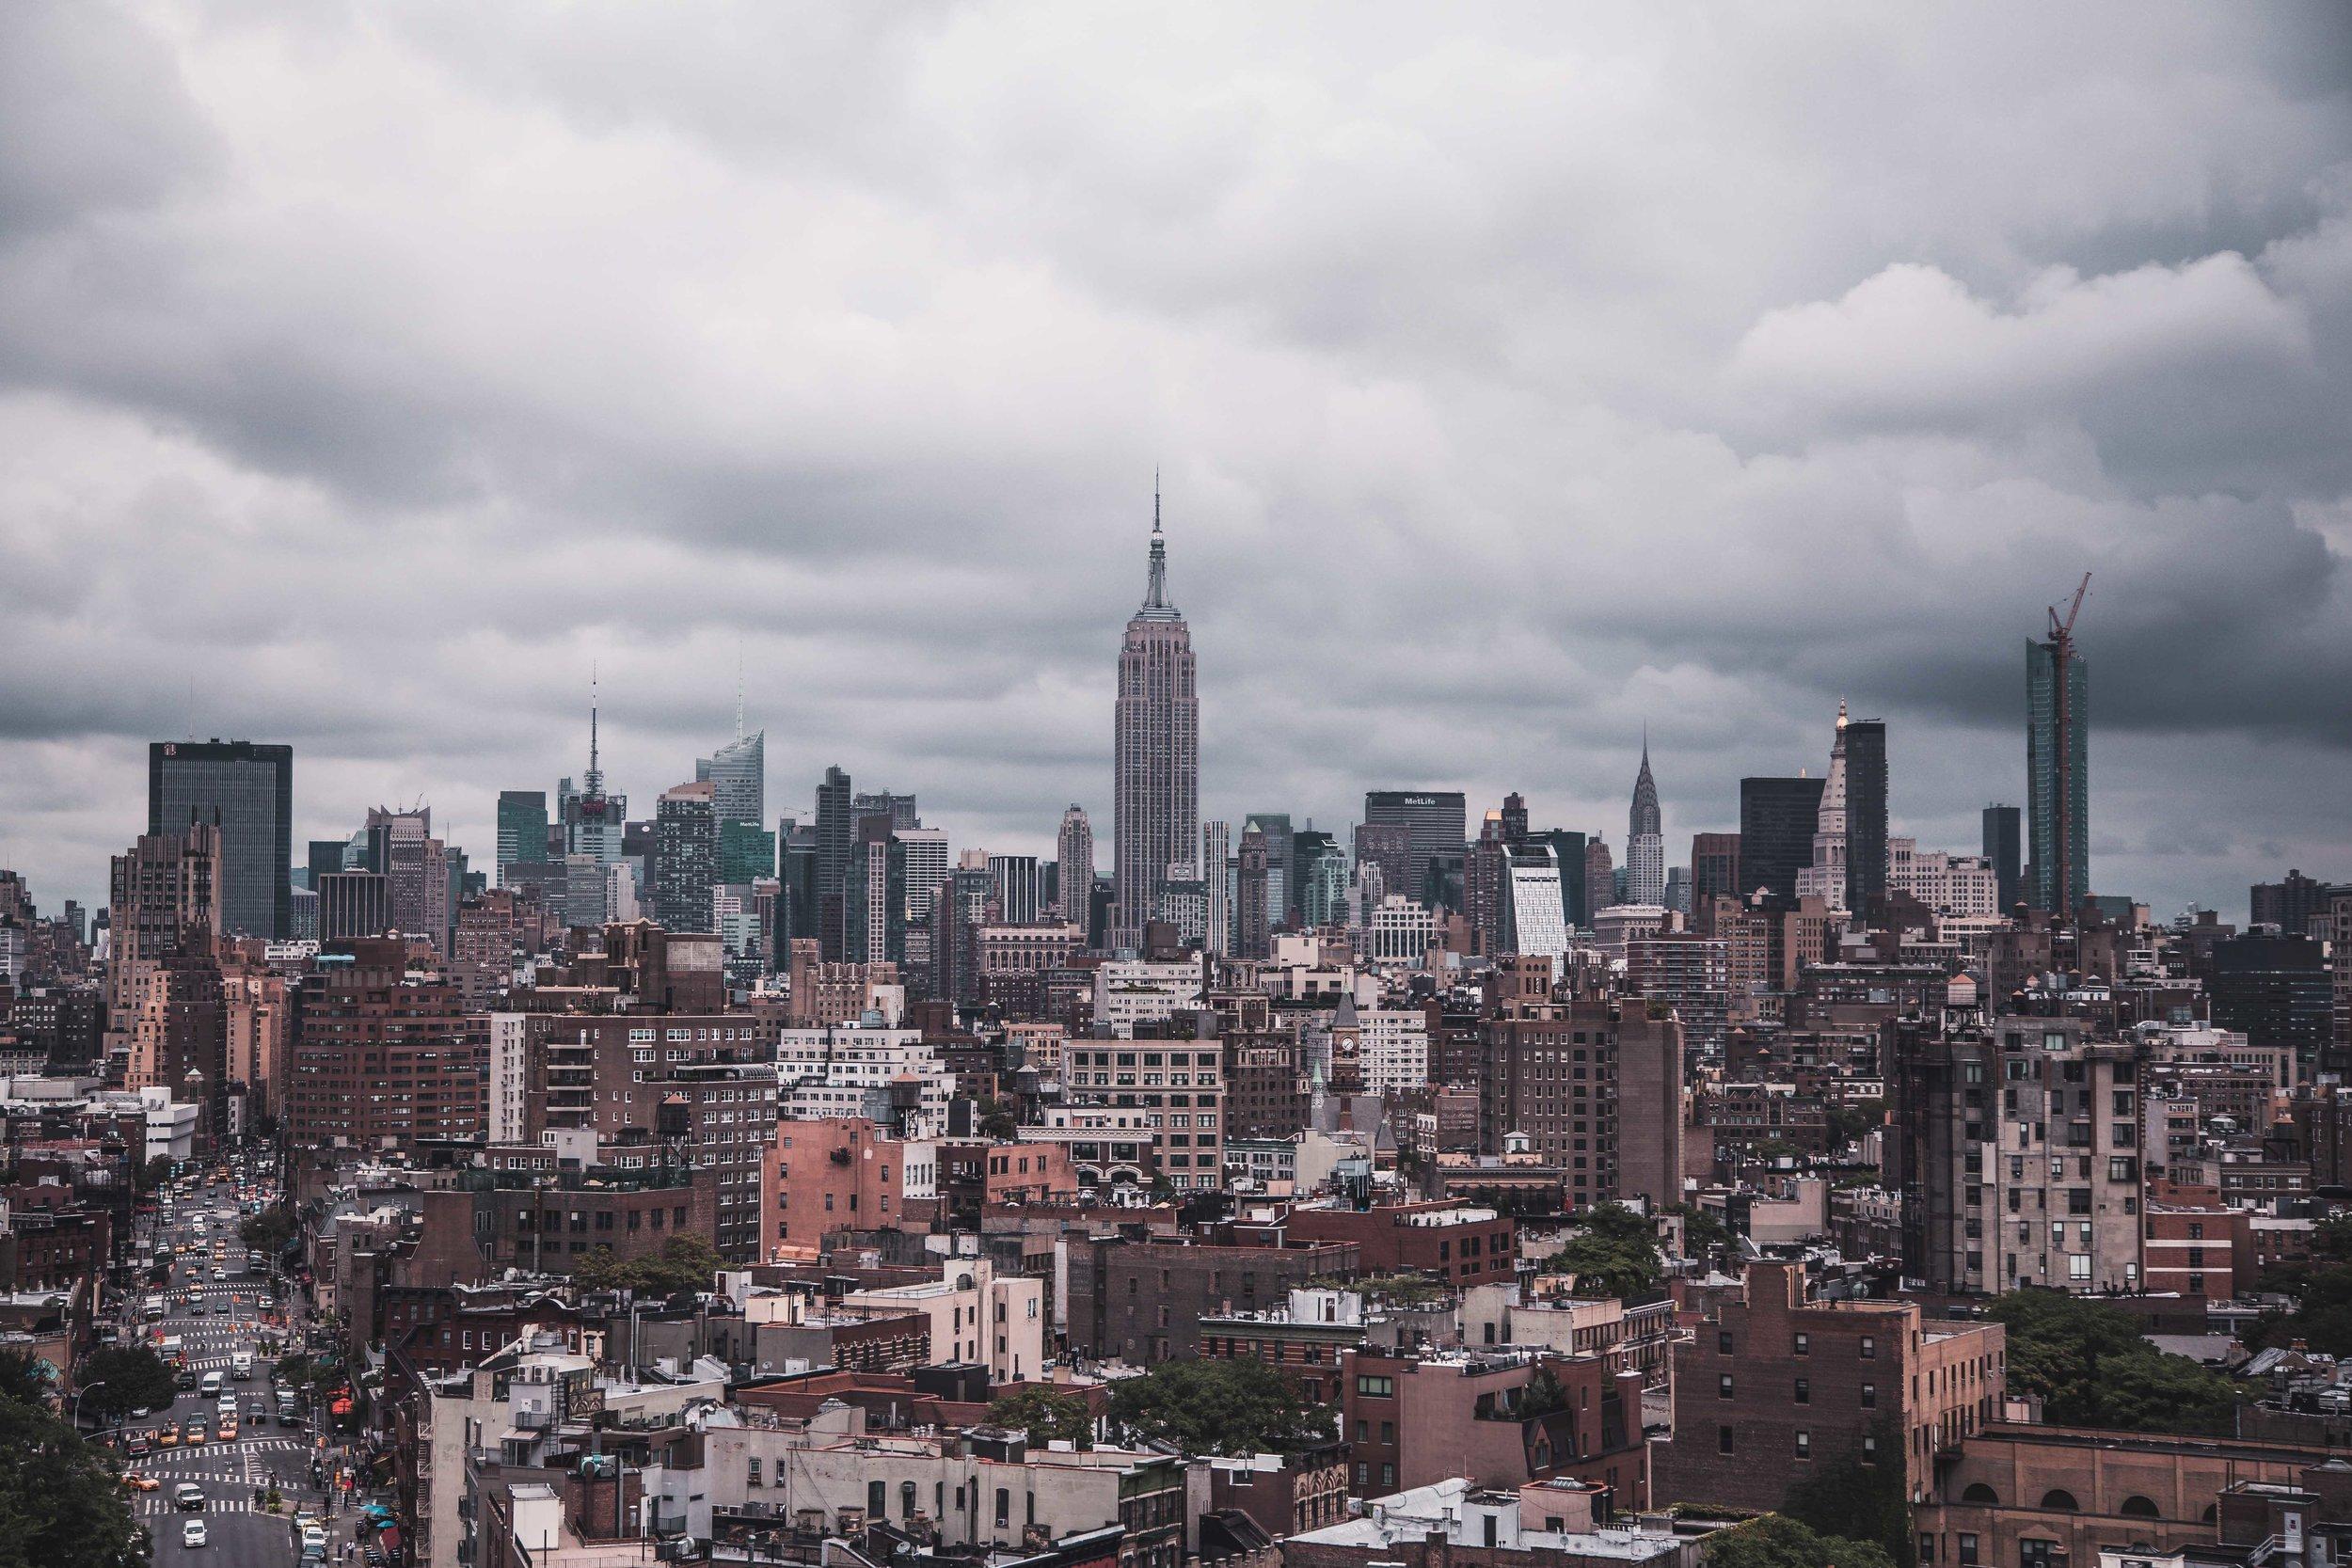 New York City by Dan Schenker